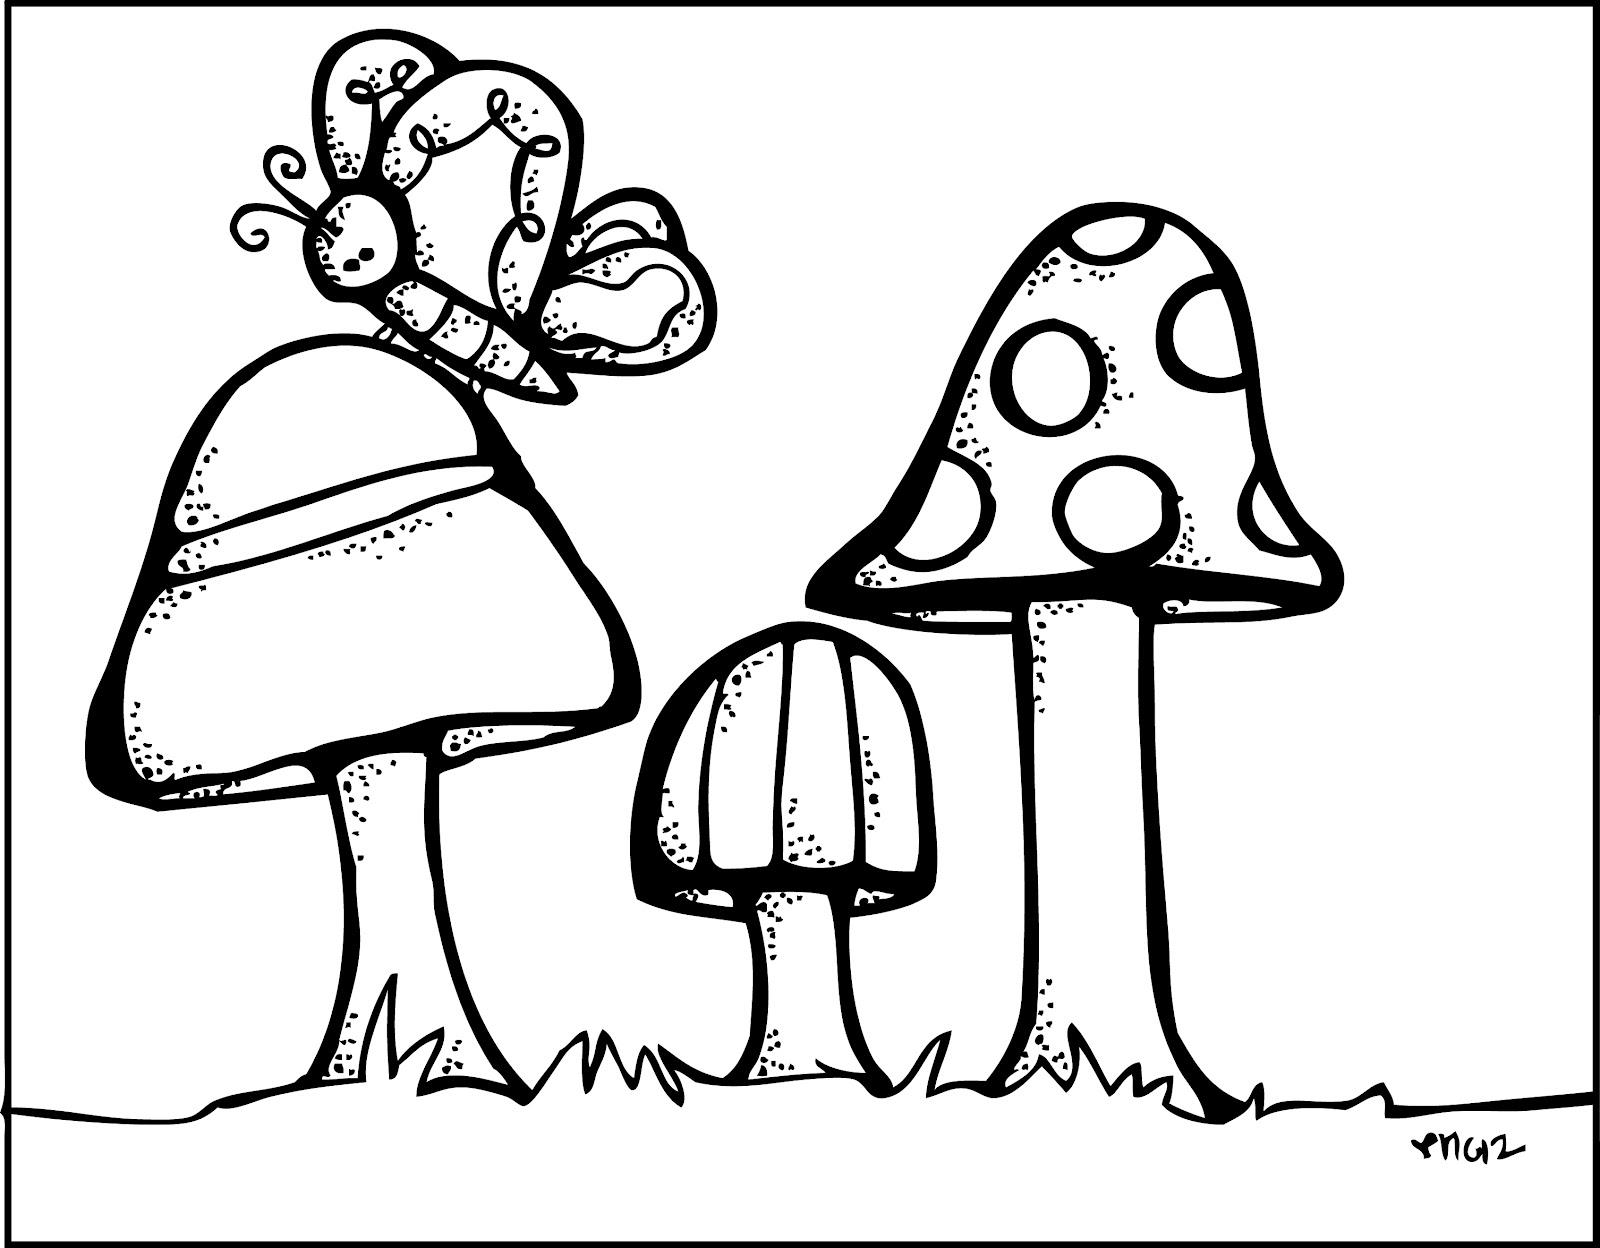 melonheadz mushroom scene rh melonheadzillustrating blogspot com melonheadz school clipart black and white melonheadz teacher clipart black and white